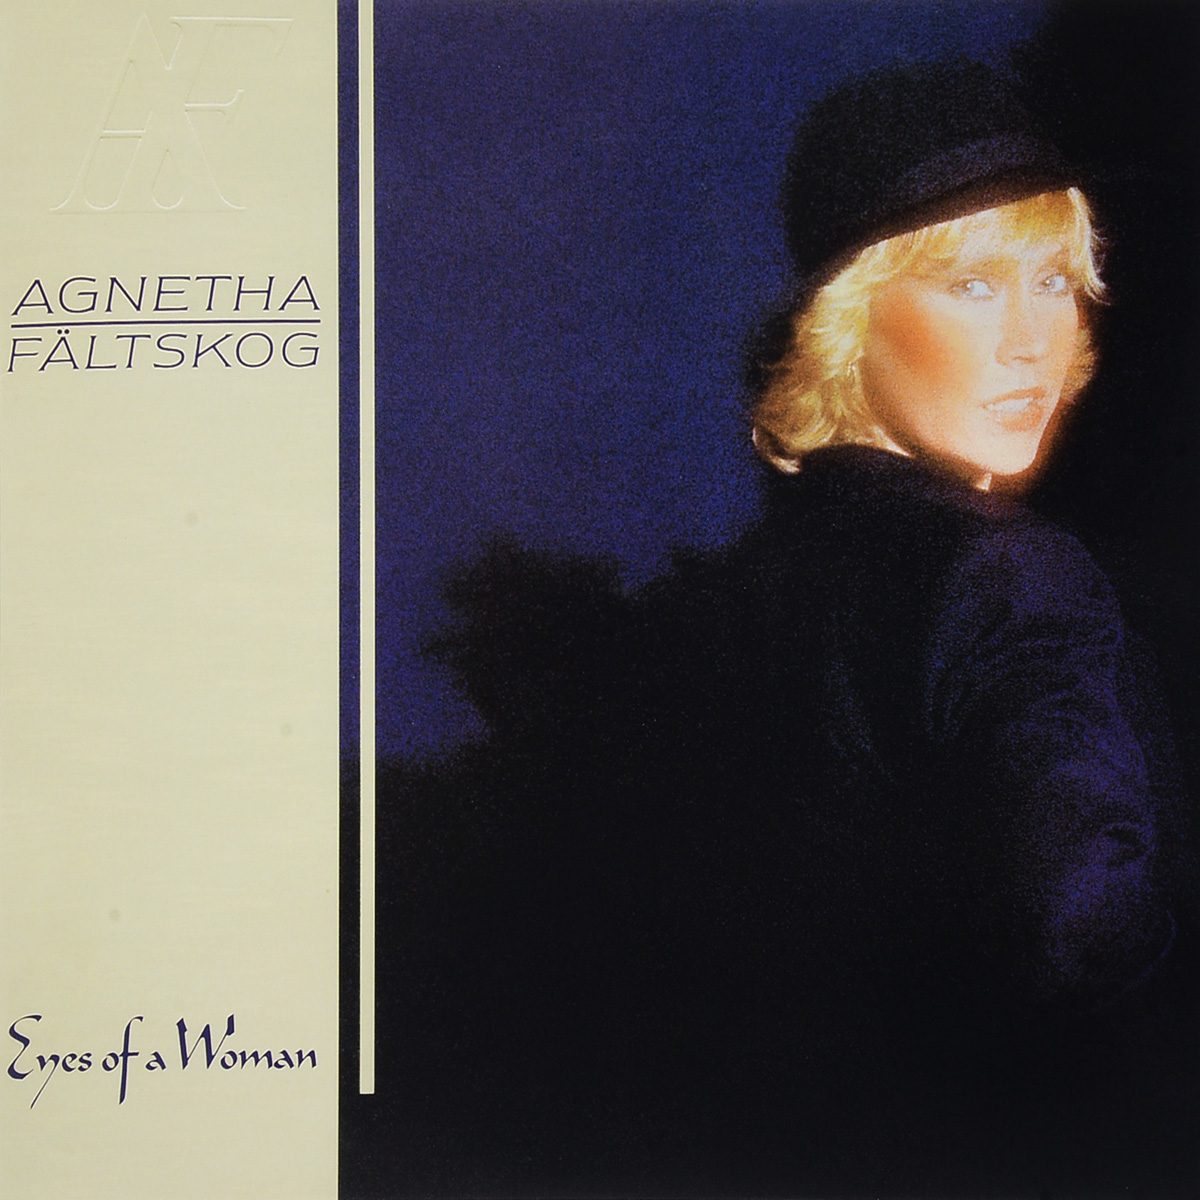 Агнета Фальтског Agnetha Faltskog. Eyes Of A Woman (Coloured Vinyl) (LP) mina mina maeba coloured vinyl lp